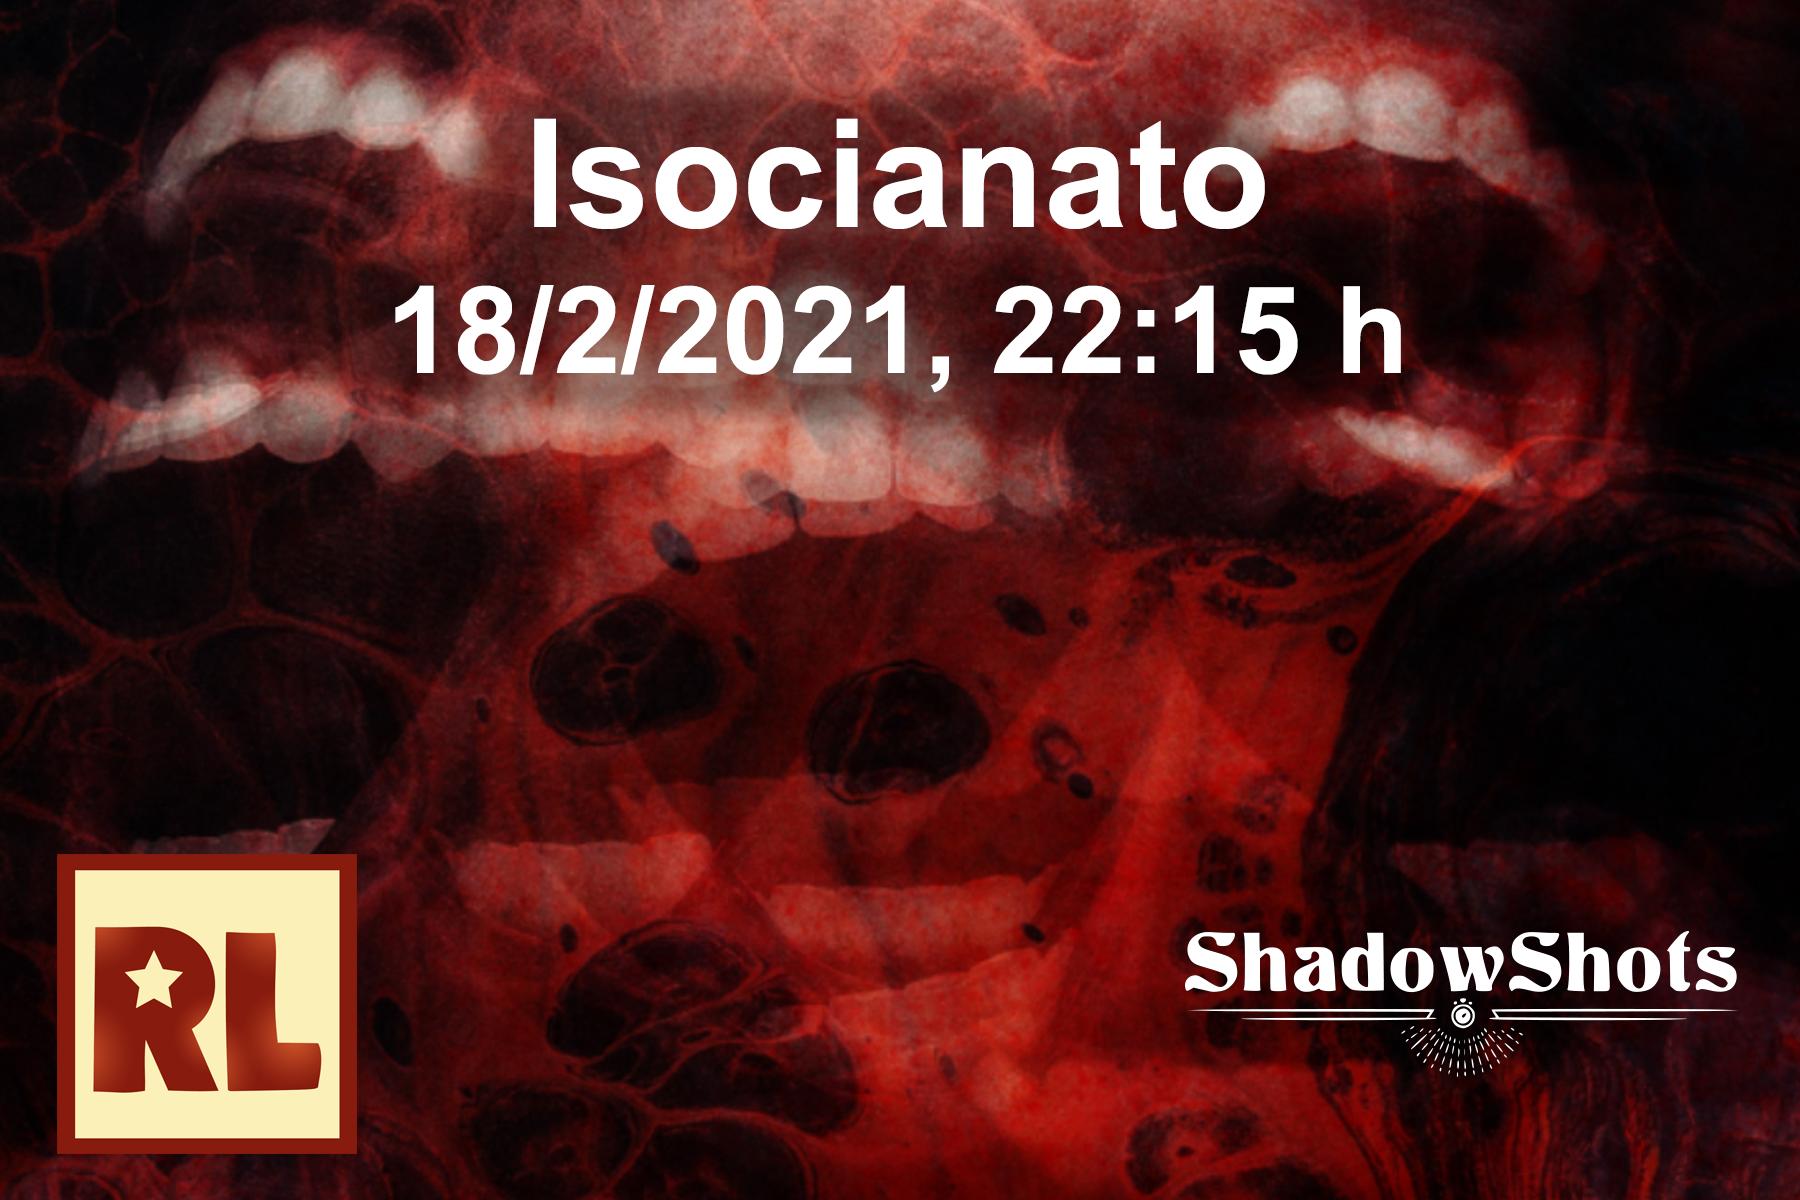 Isocianato (Shadowshot)